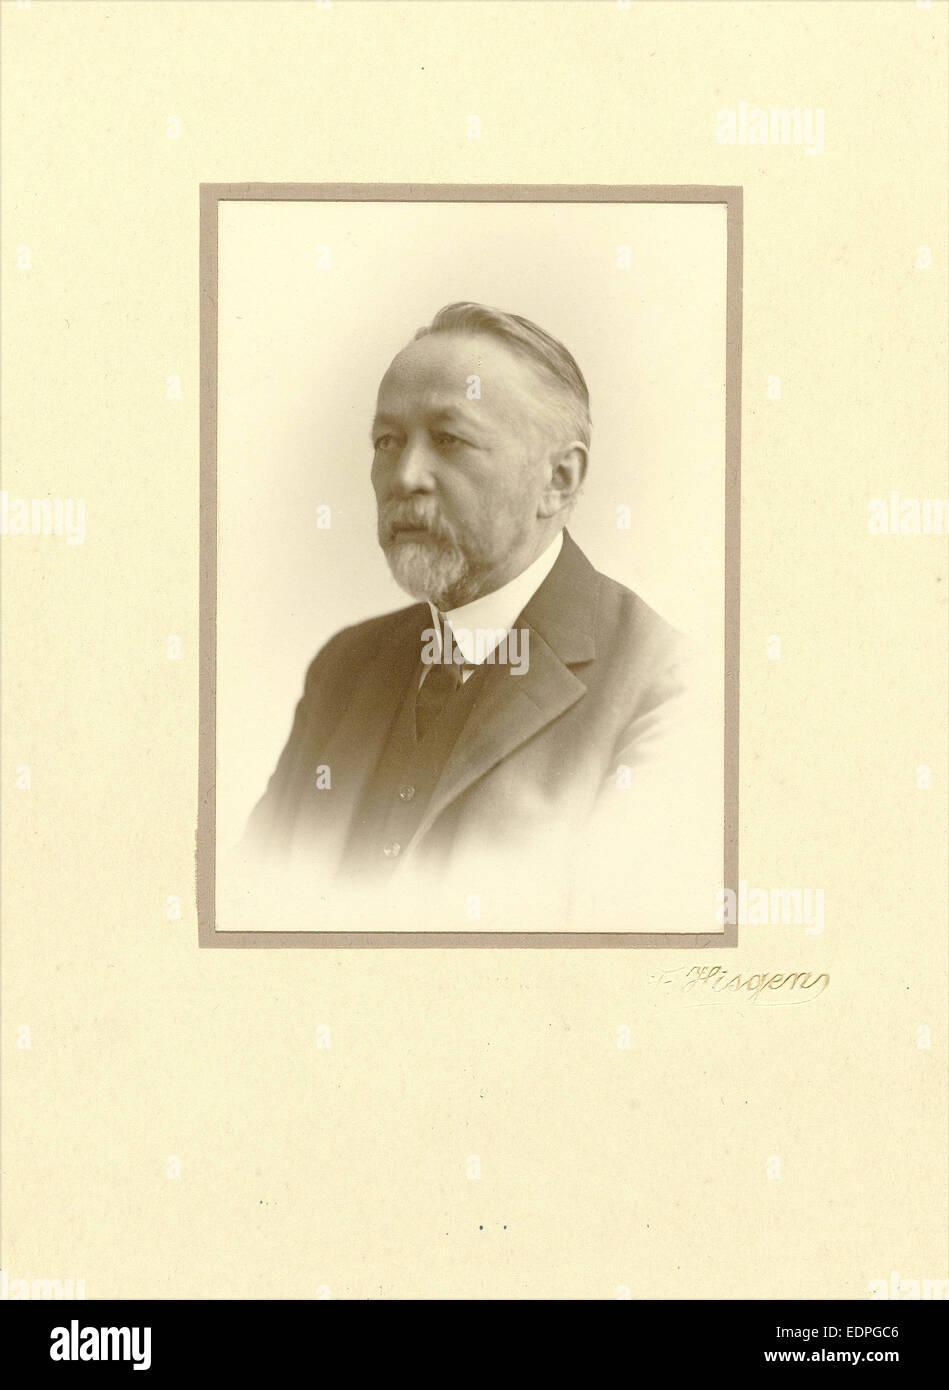 Andries Bonger en la edad media, Julius Heinrich Hisgen, Firma F. Hisgen, 1930 - 1936 Imagen De Stock